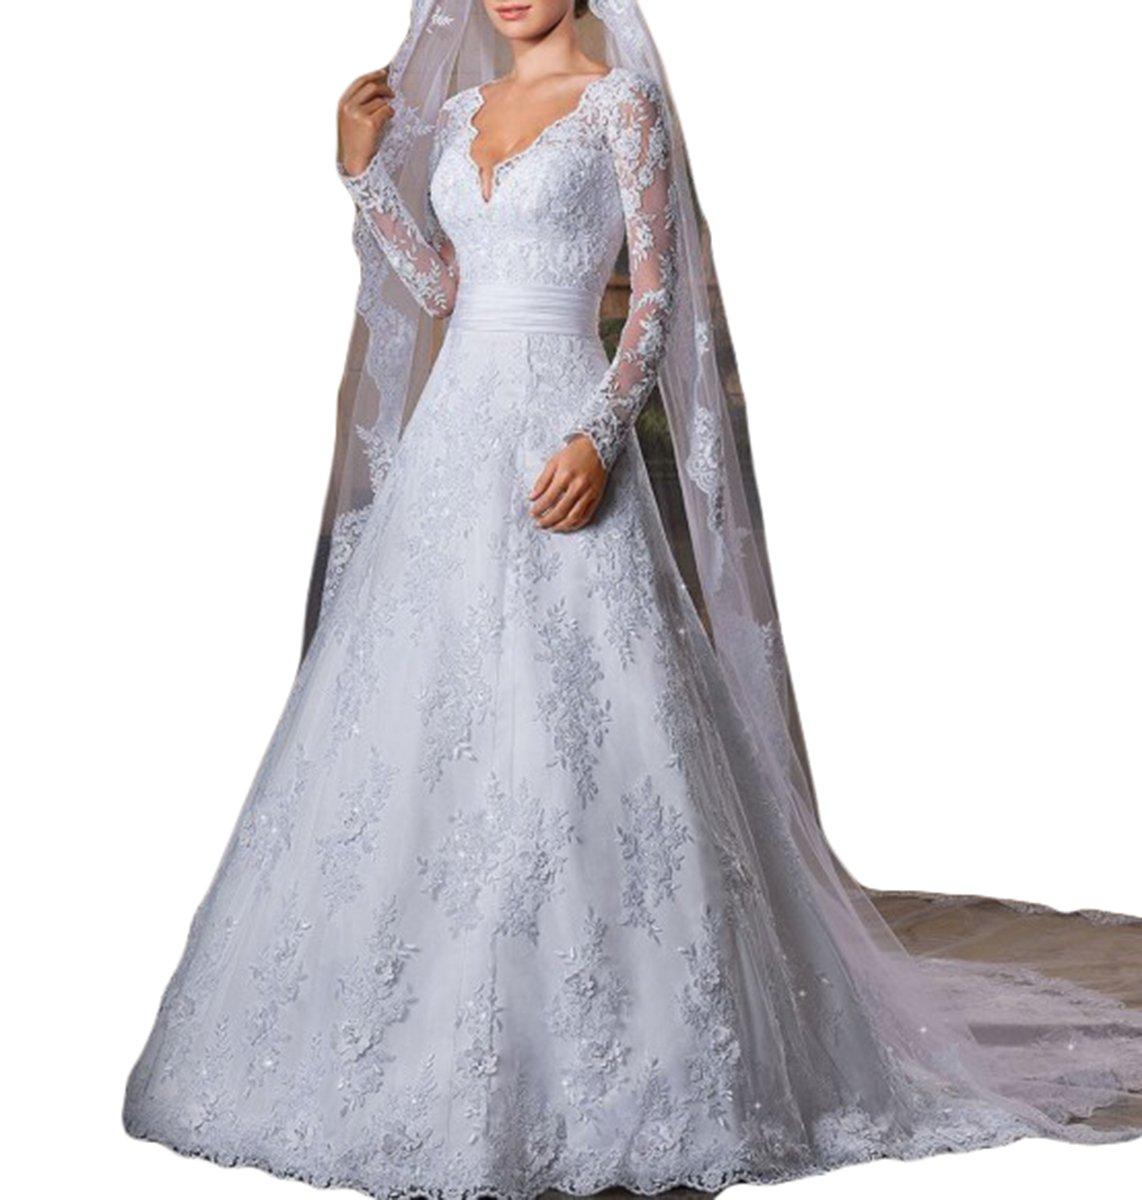 Vweil Vintage Inspired Vestidos De novia Long Sleeve Lace Bridal Wedding Gowns For Women White US8